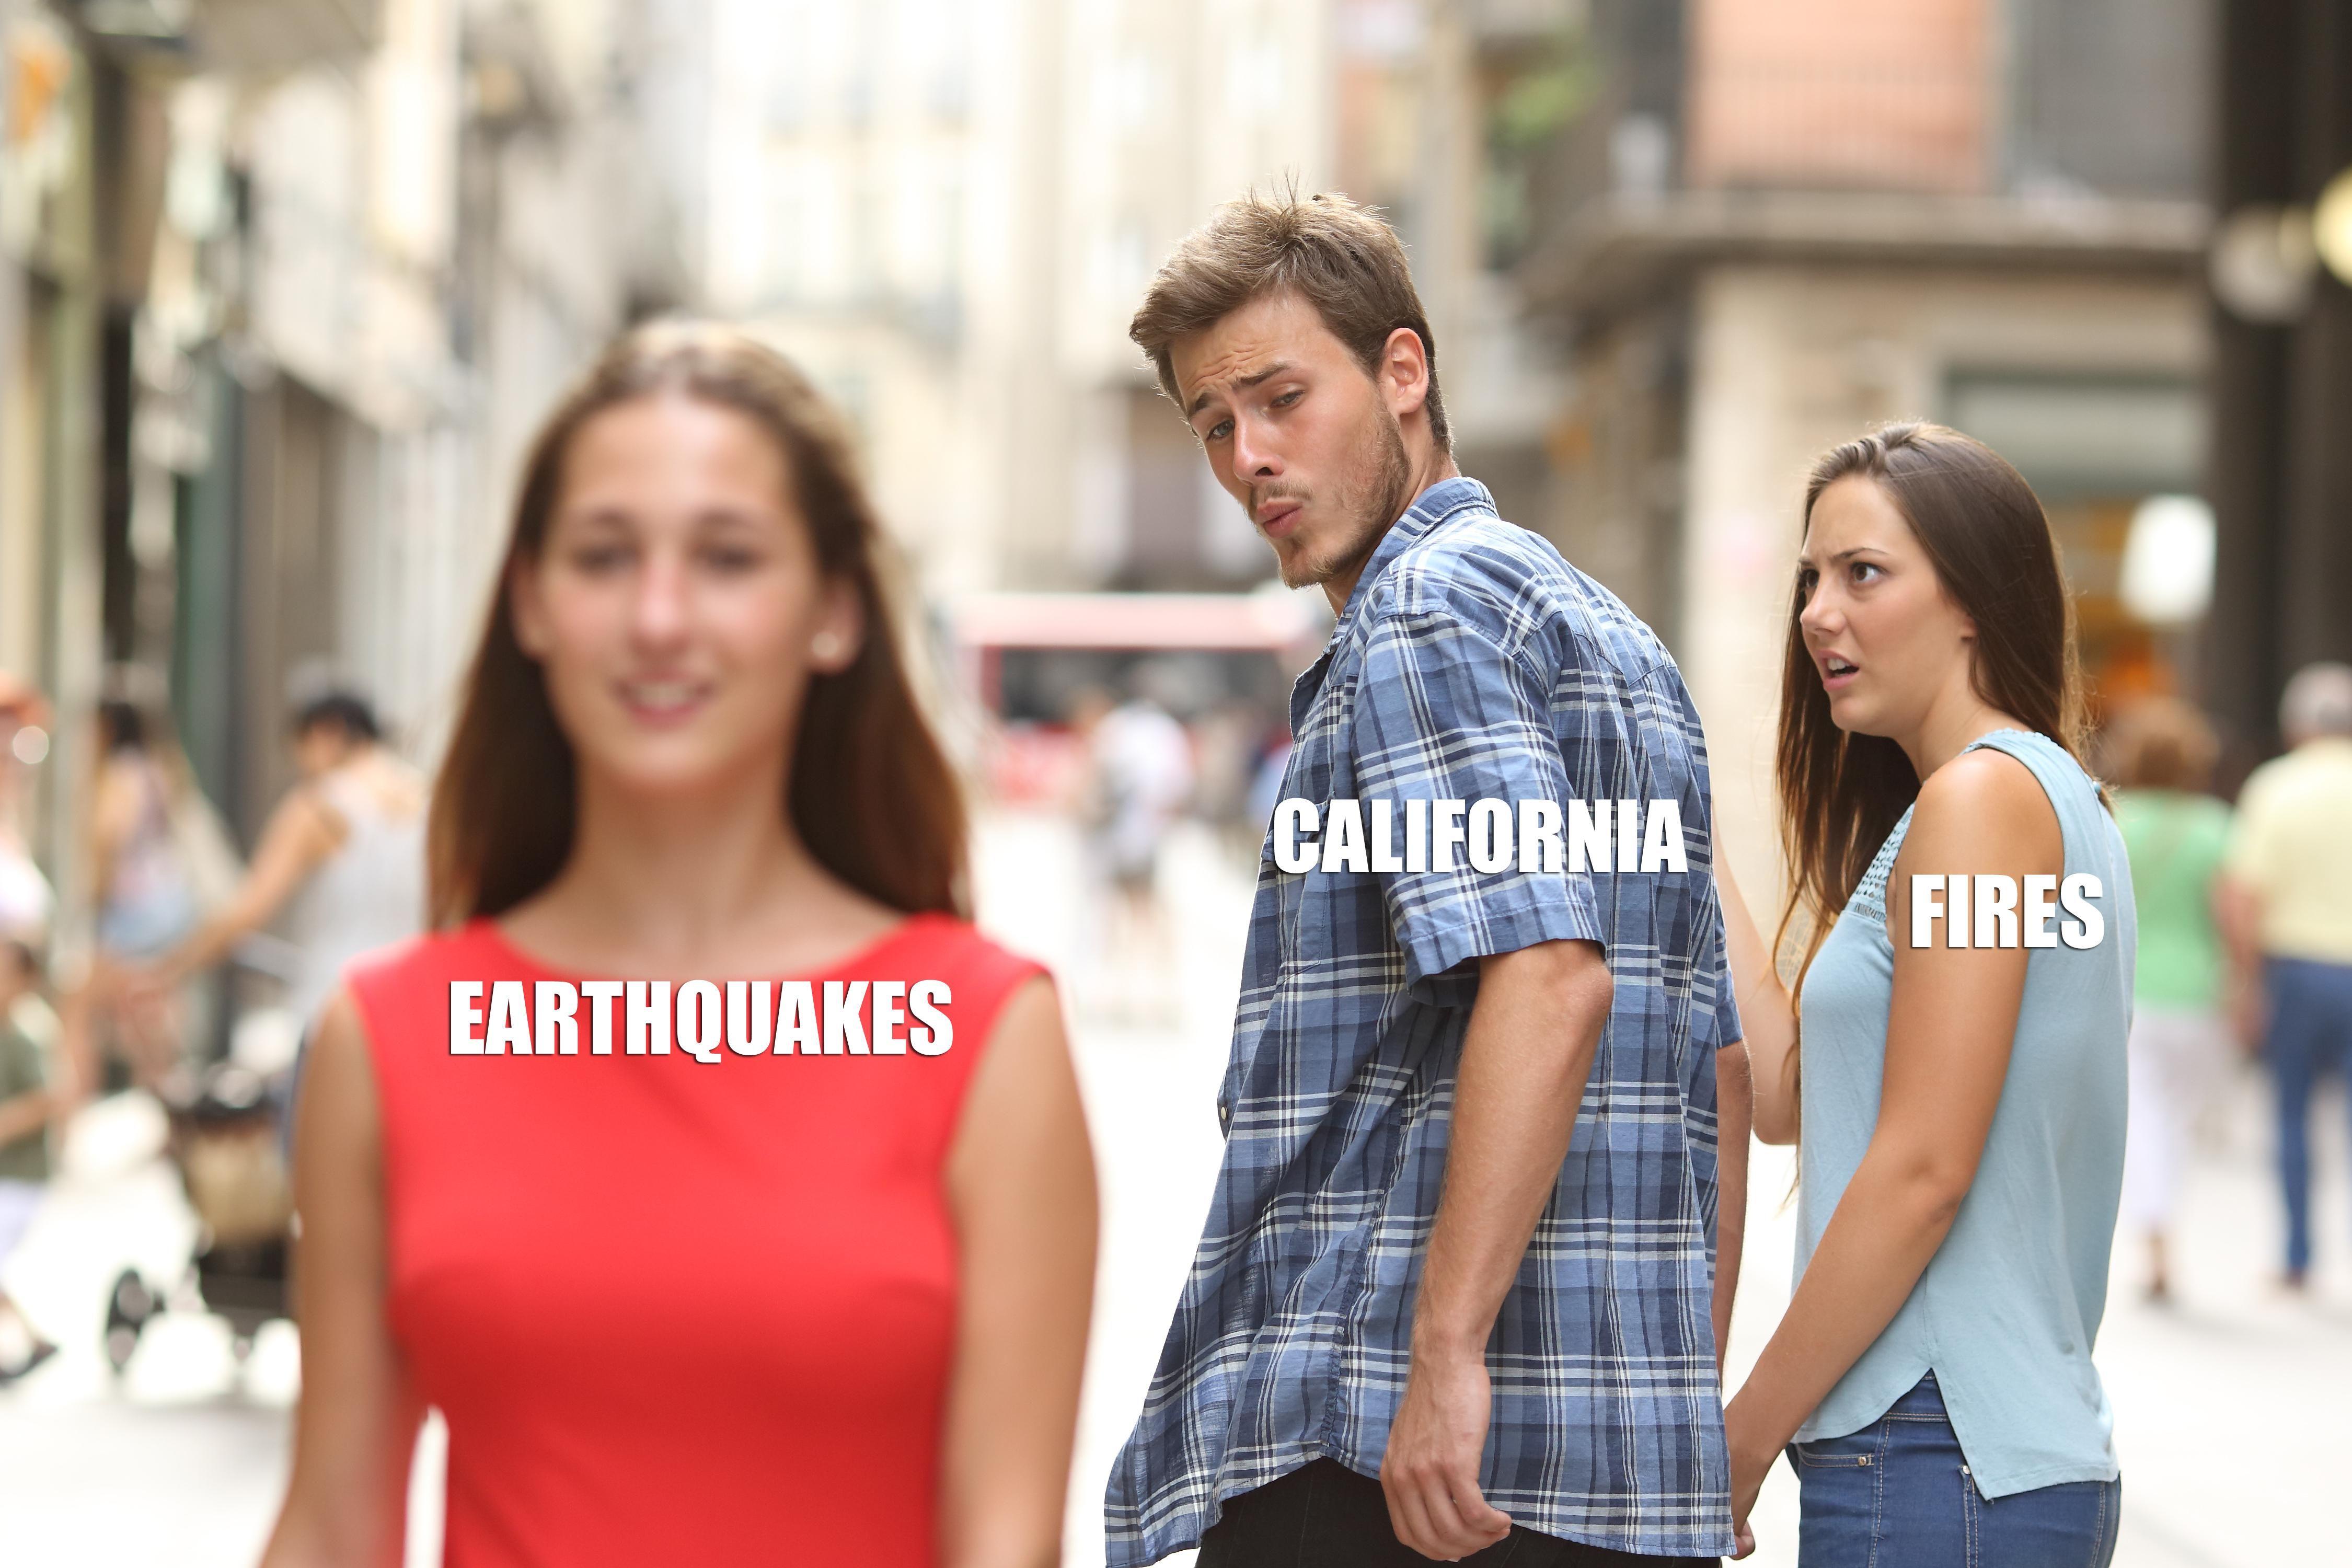 California - shaken or lit?